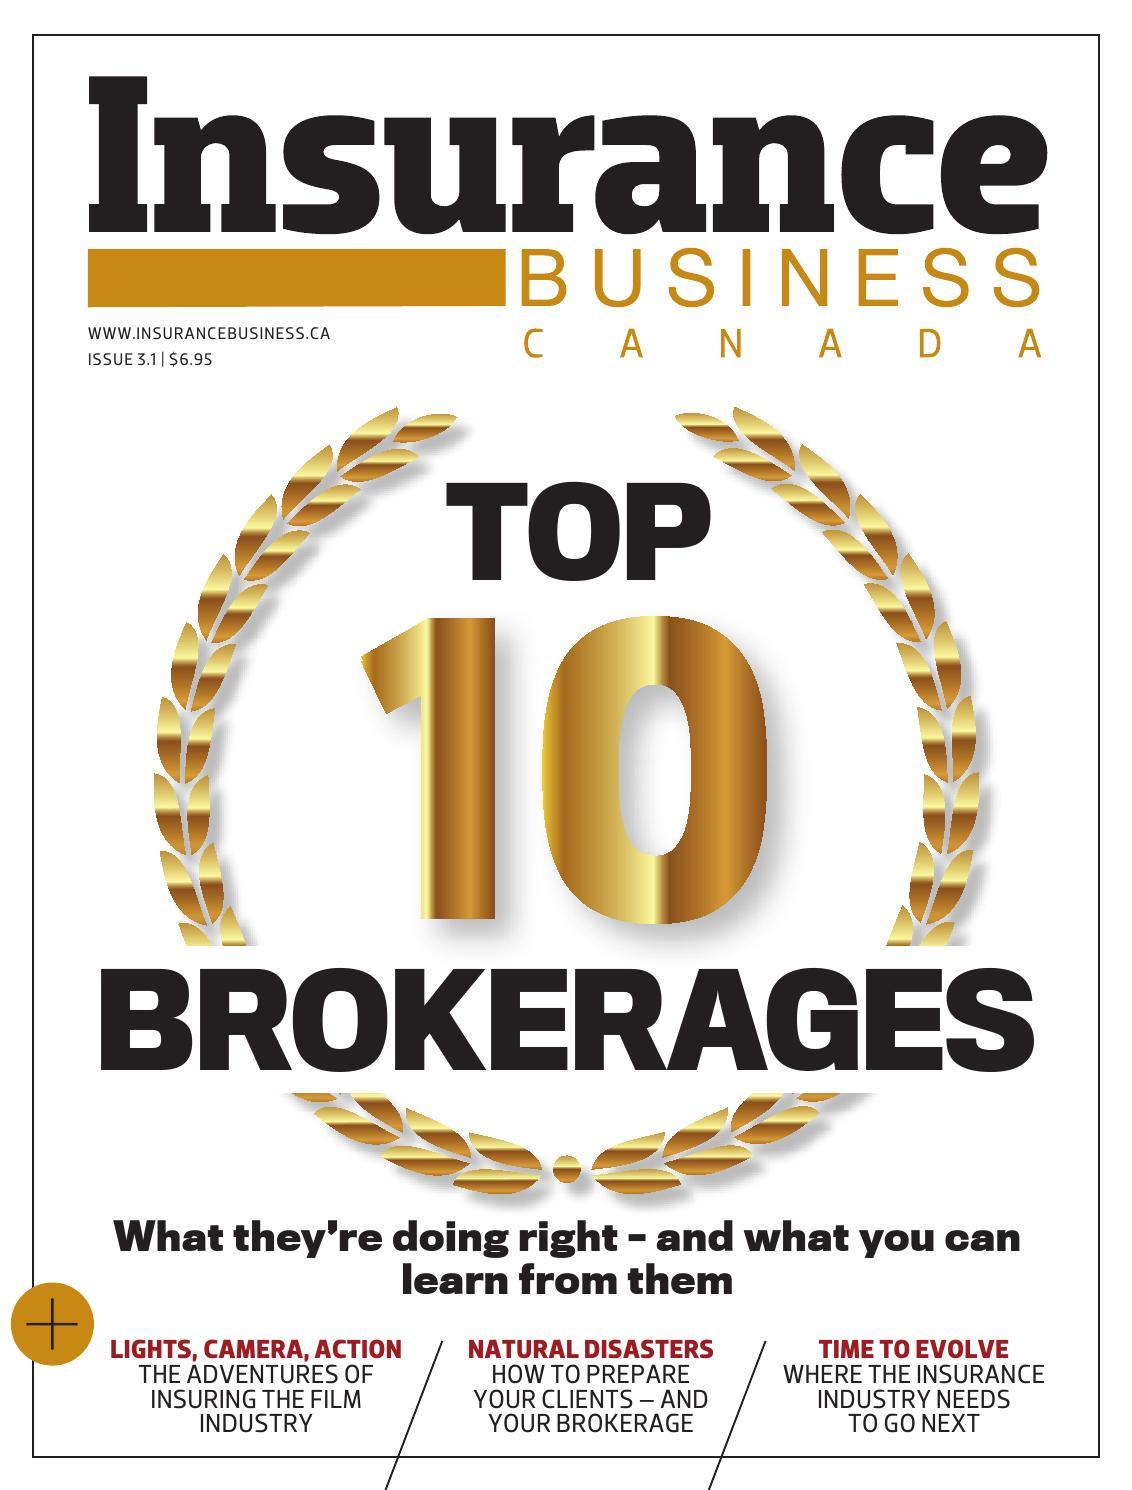 Insurance Business Canada 3.01 by Key Media - Issuu